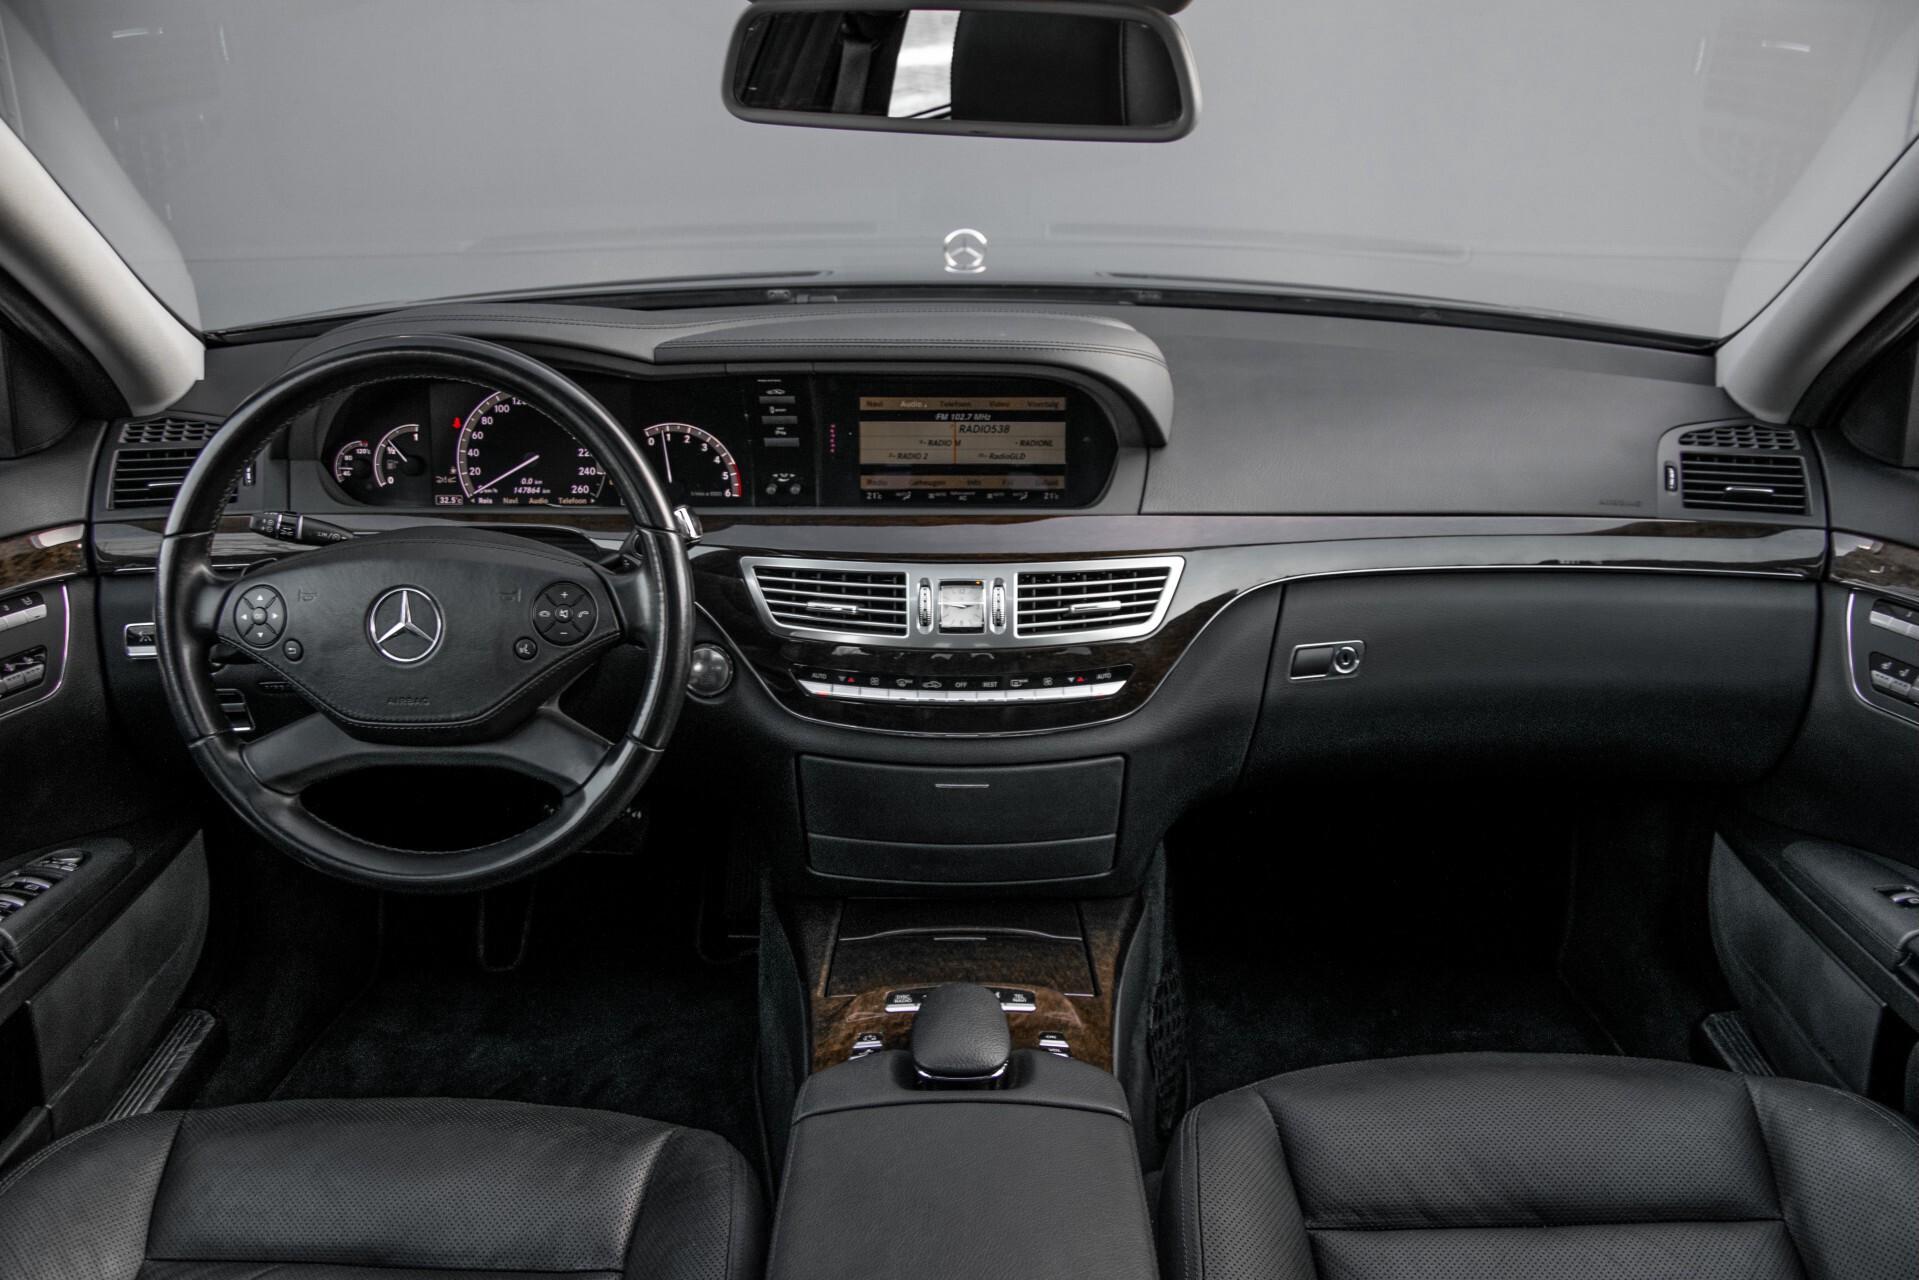 Mercedes-Benz S-Klasse 350 Bluetec Keyless/Distronic/Nightvision/Schuifdak/Harman-Kardon Aut7 Foto 8